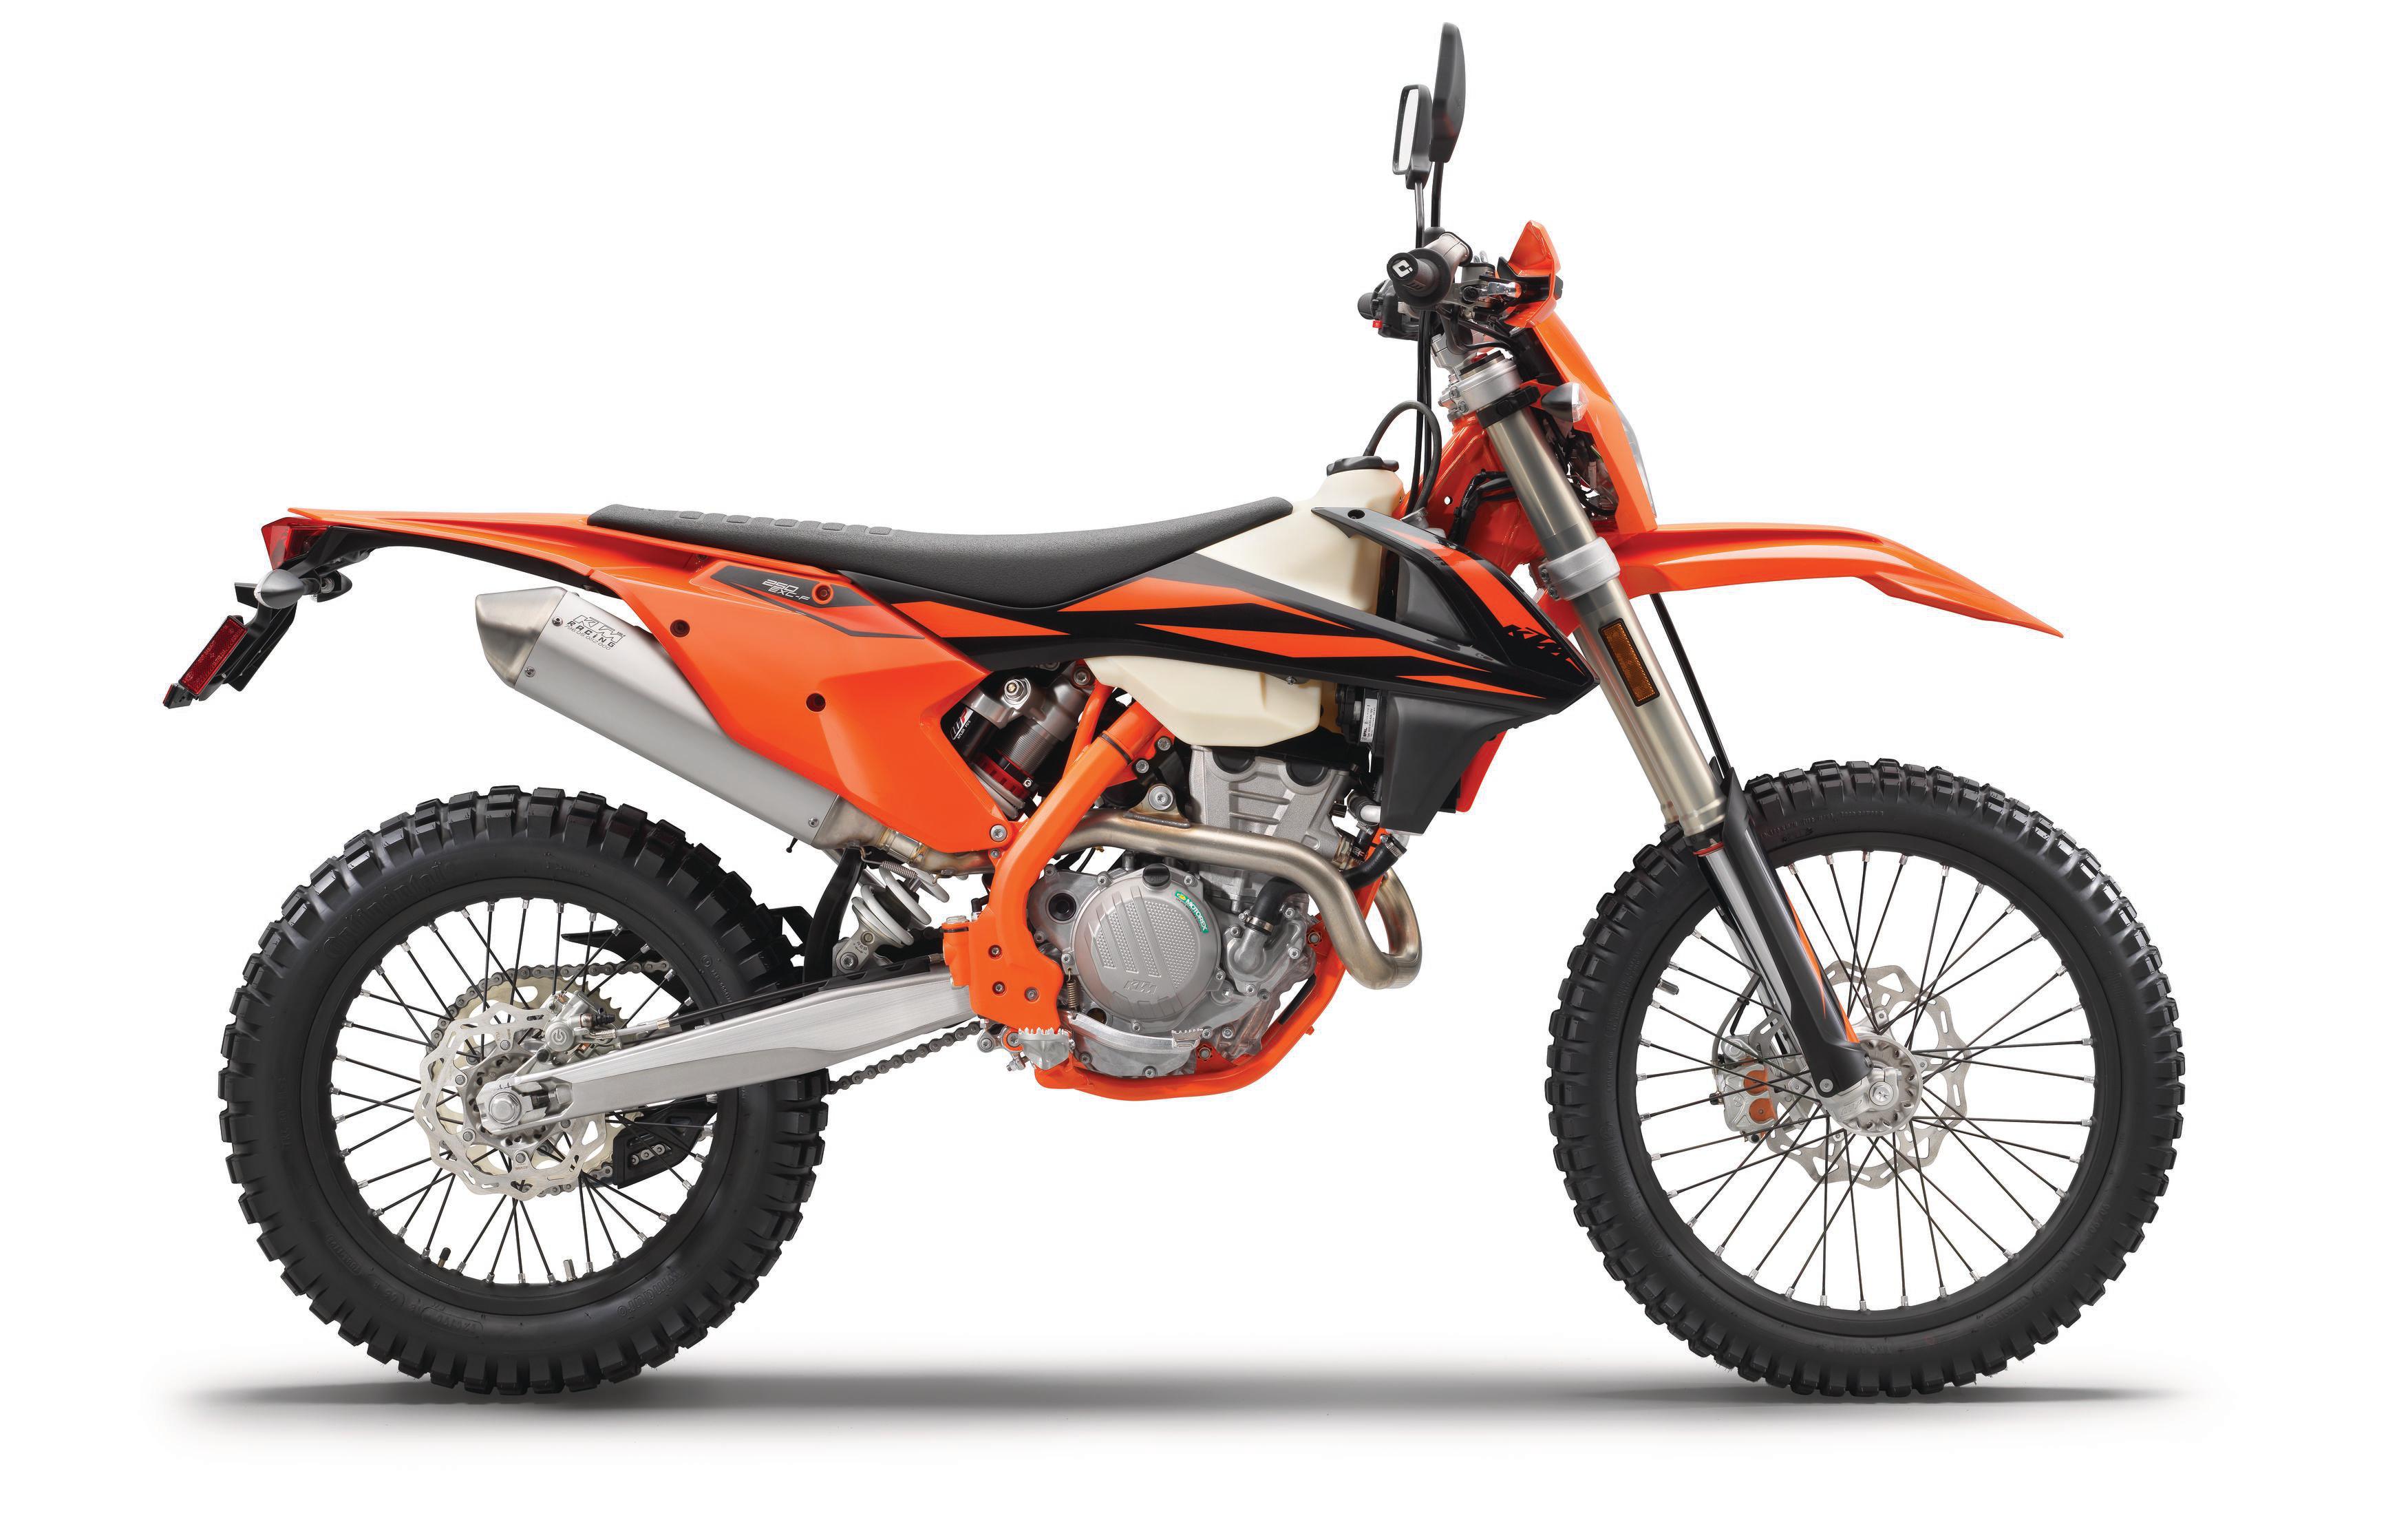 250 EXCF